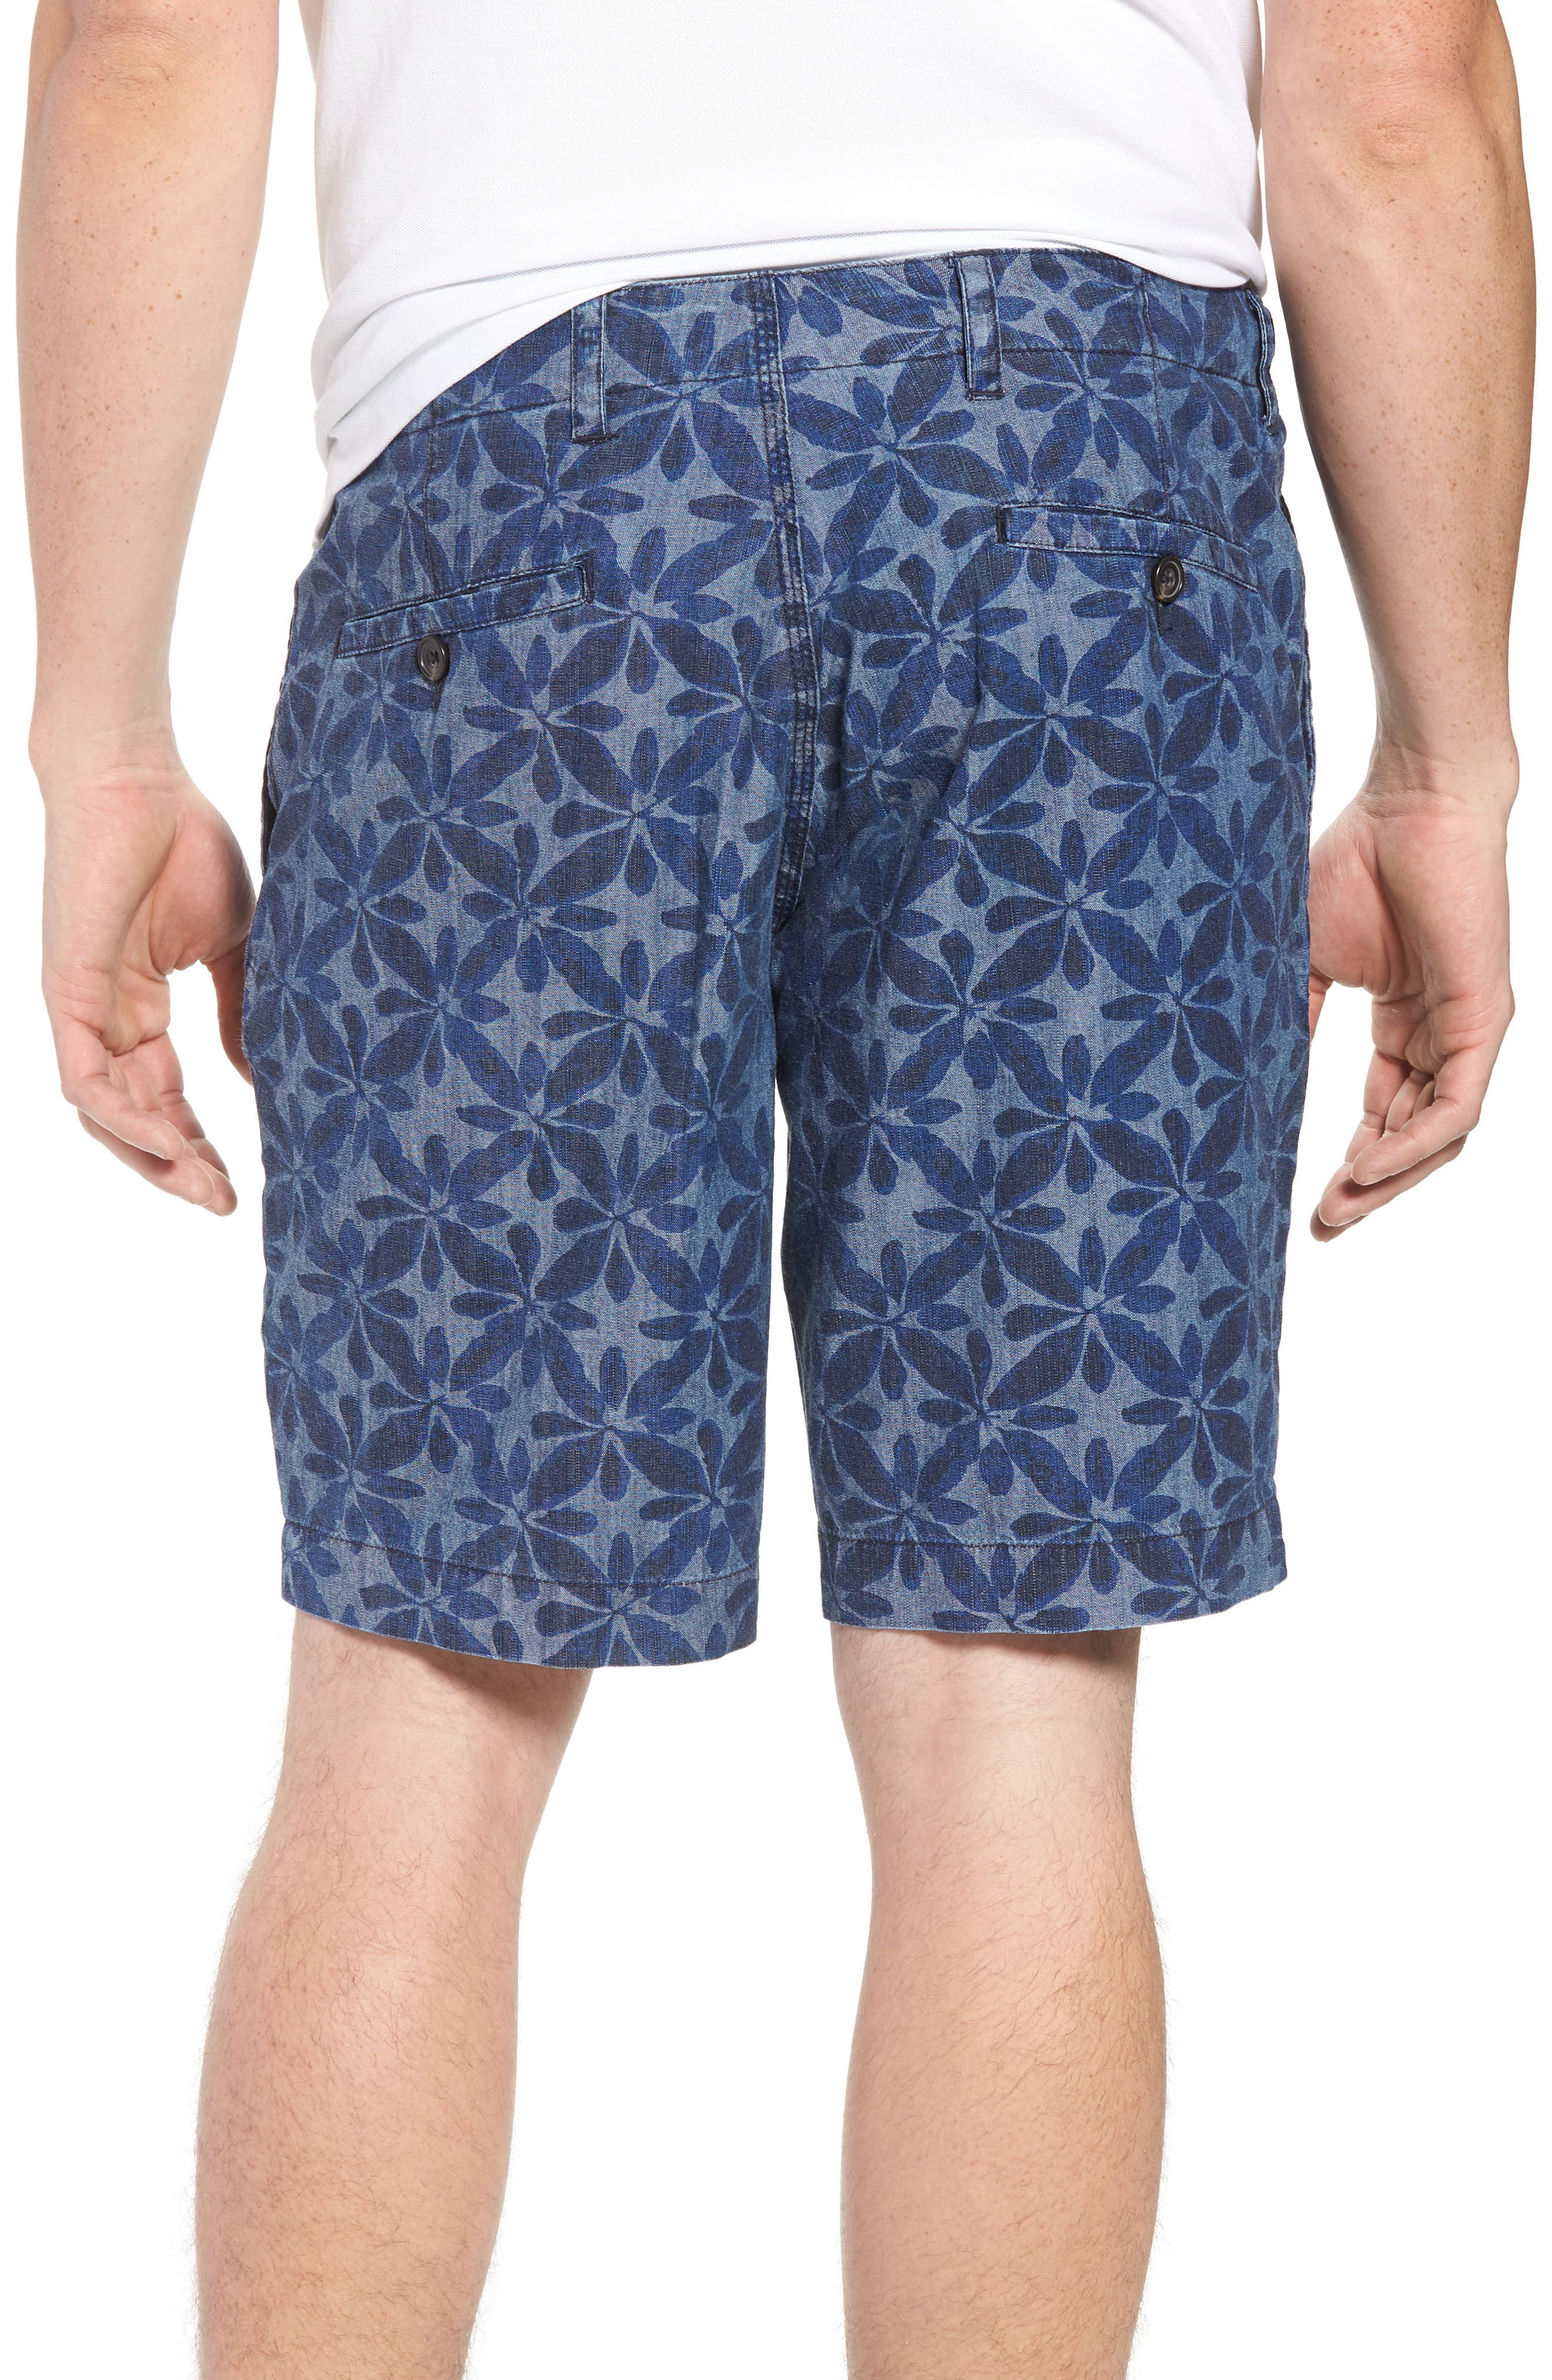 Franju Floral Cotton Shorts,                             Alternate thumbnail 2, color,